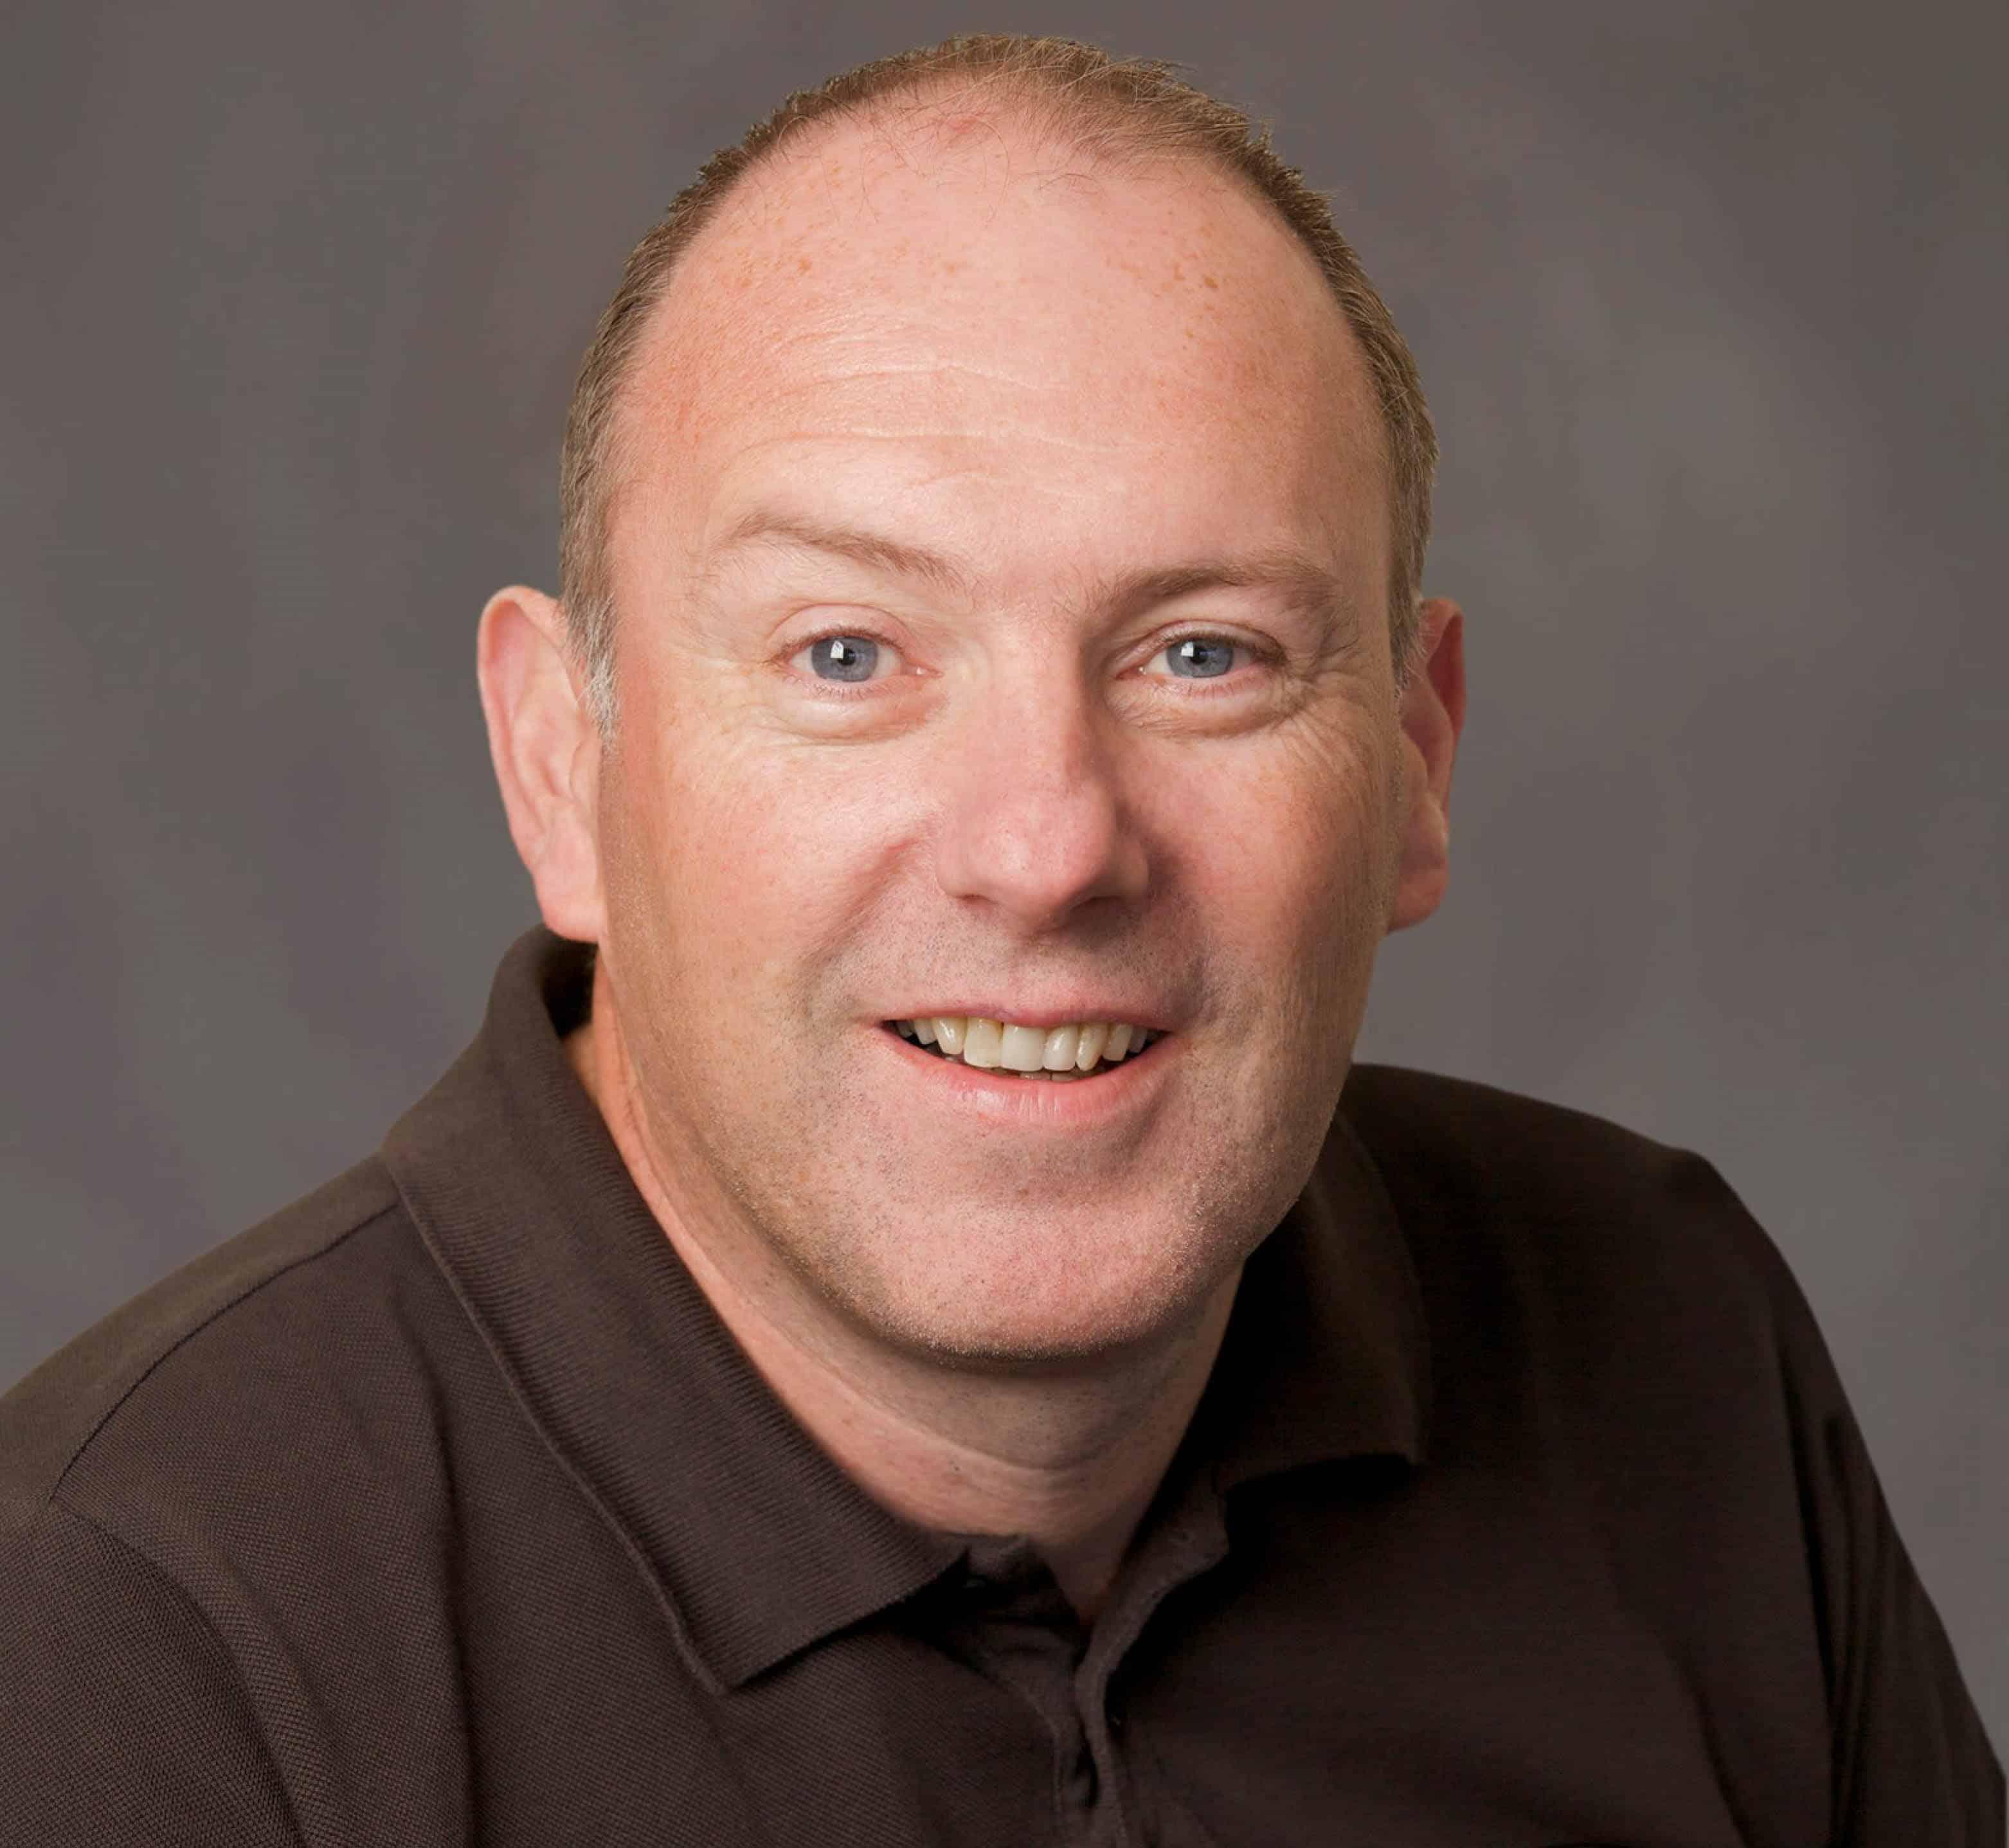 Shane Healy